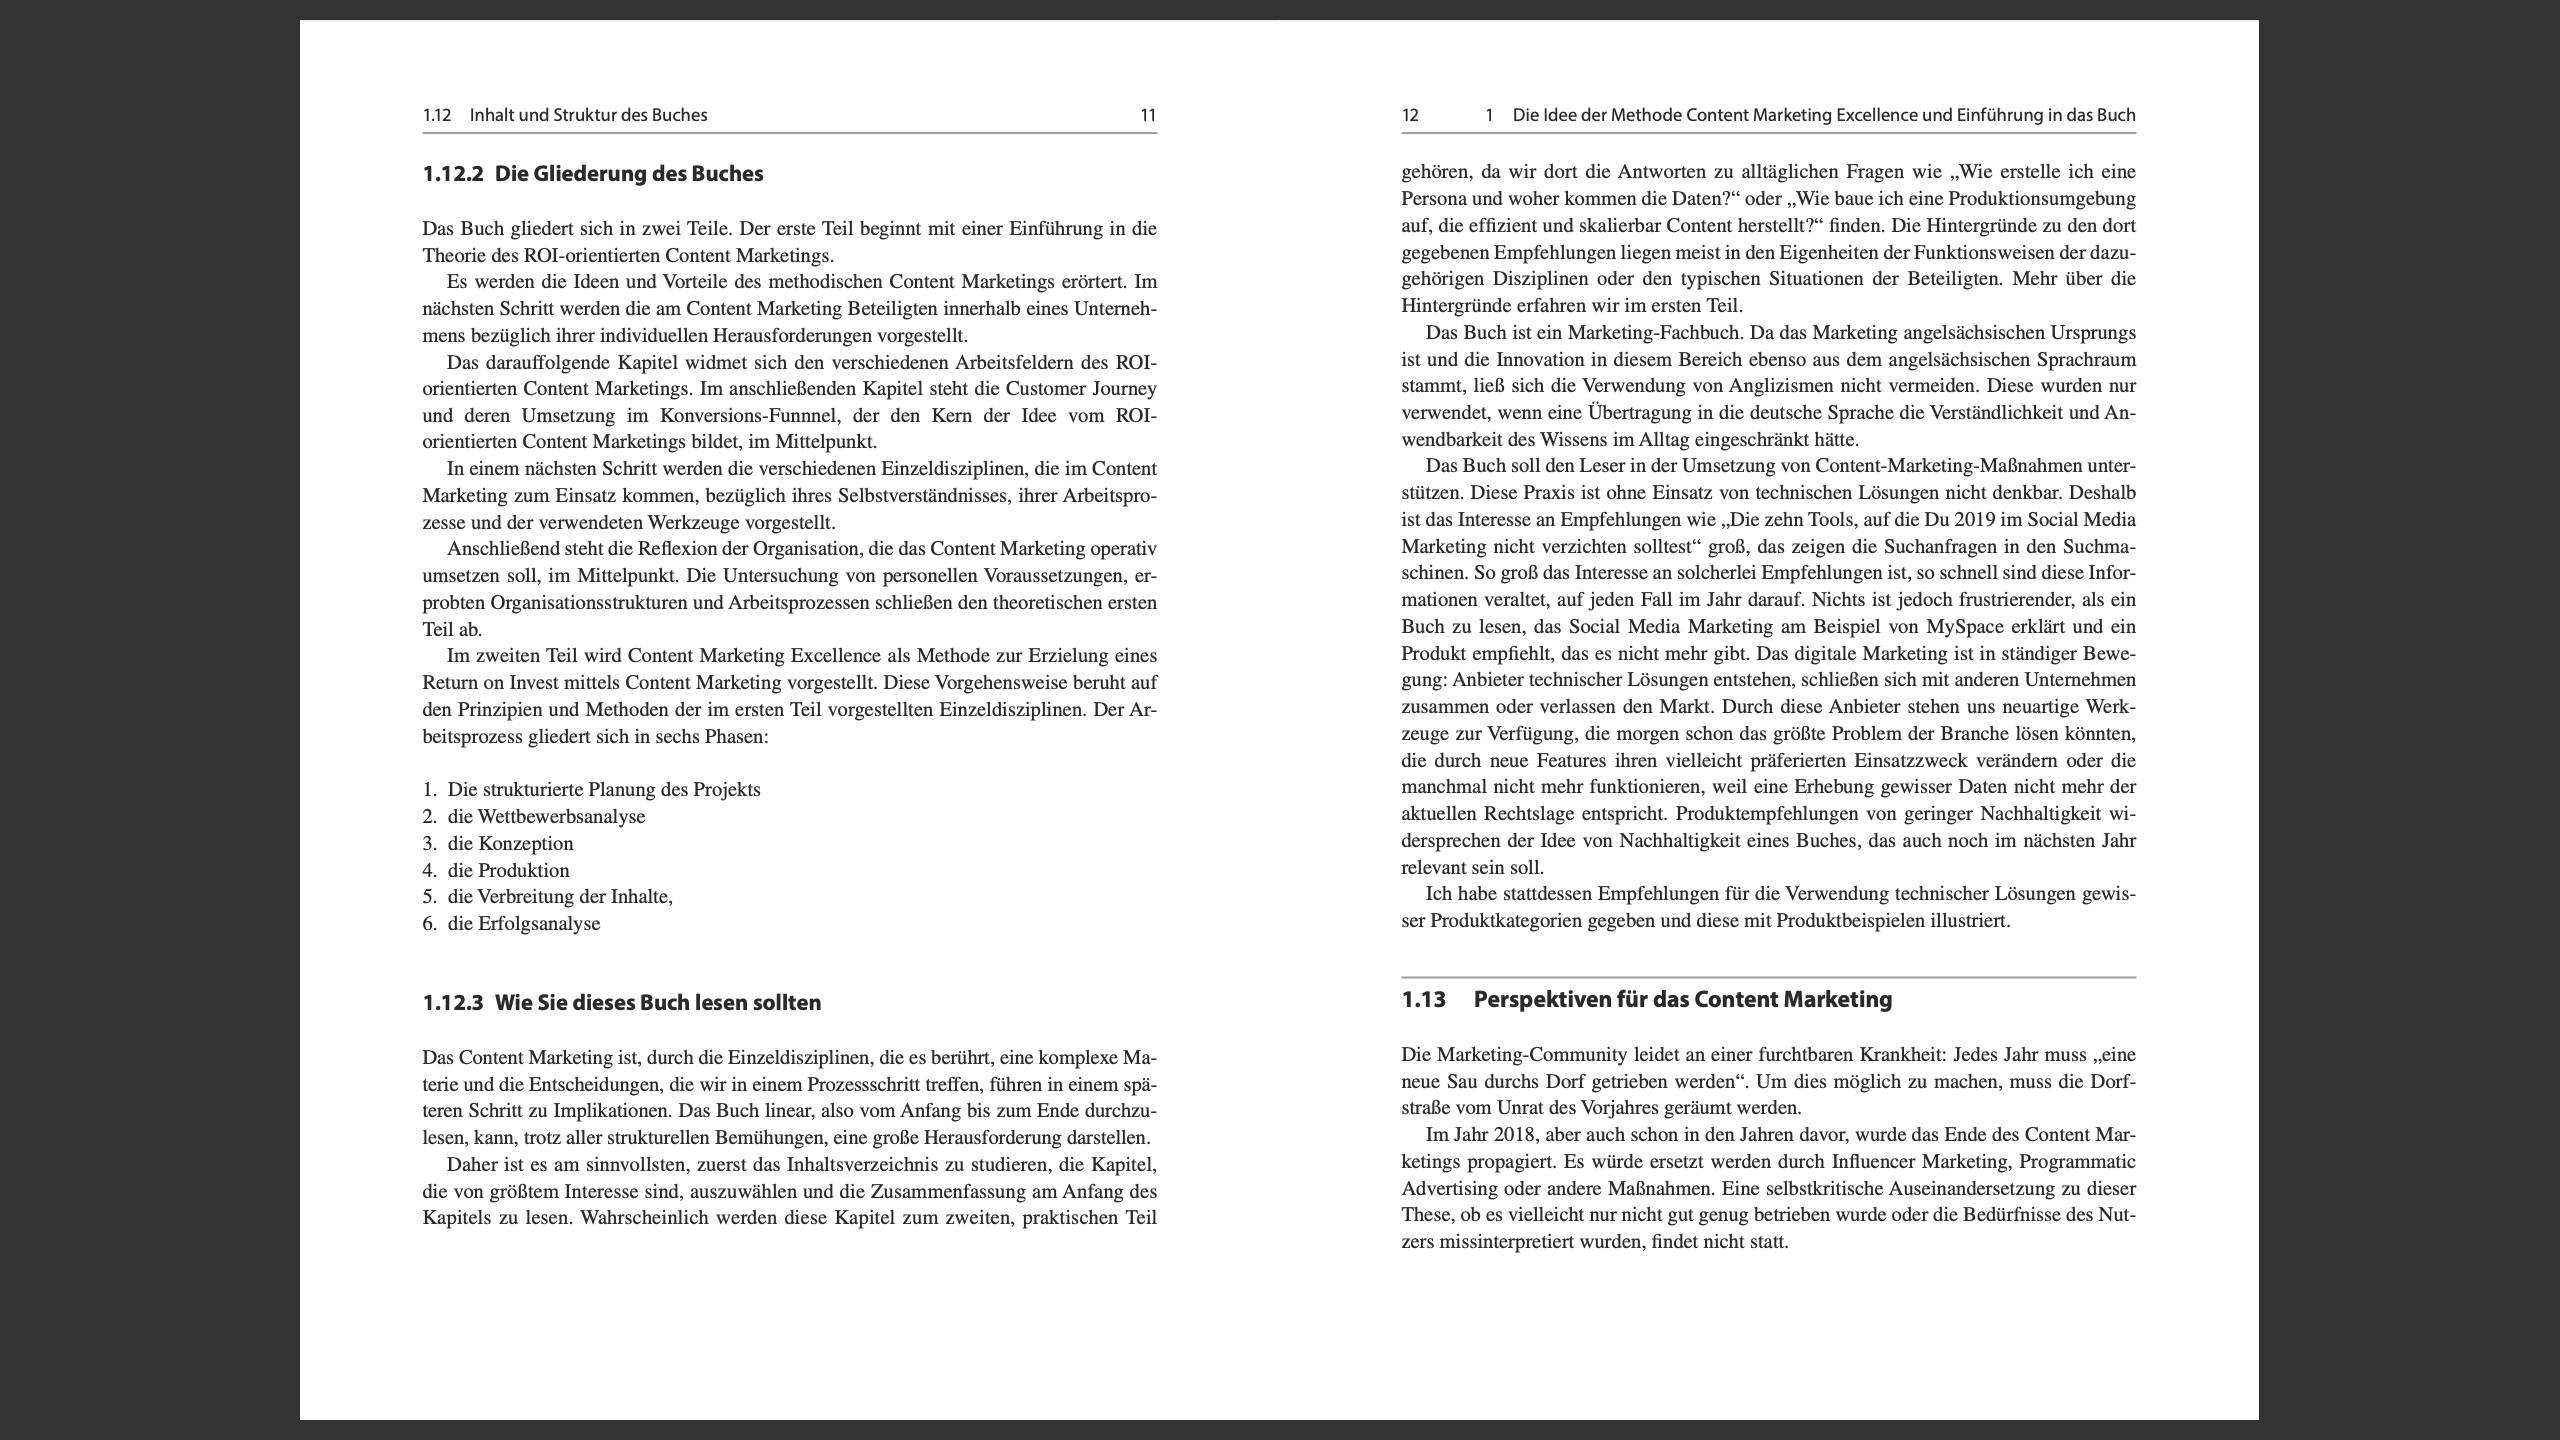 4-Methodisches-Content-Marketing-Gerrit-Grunert